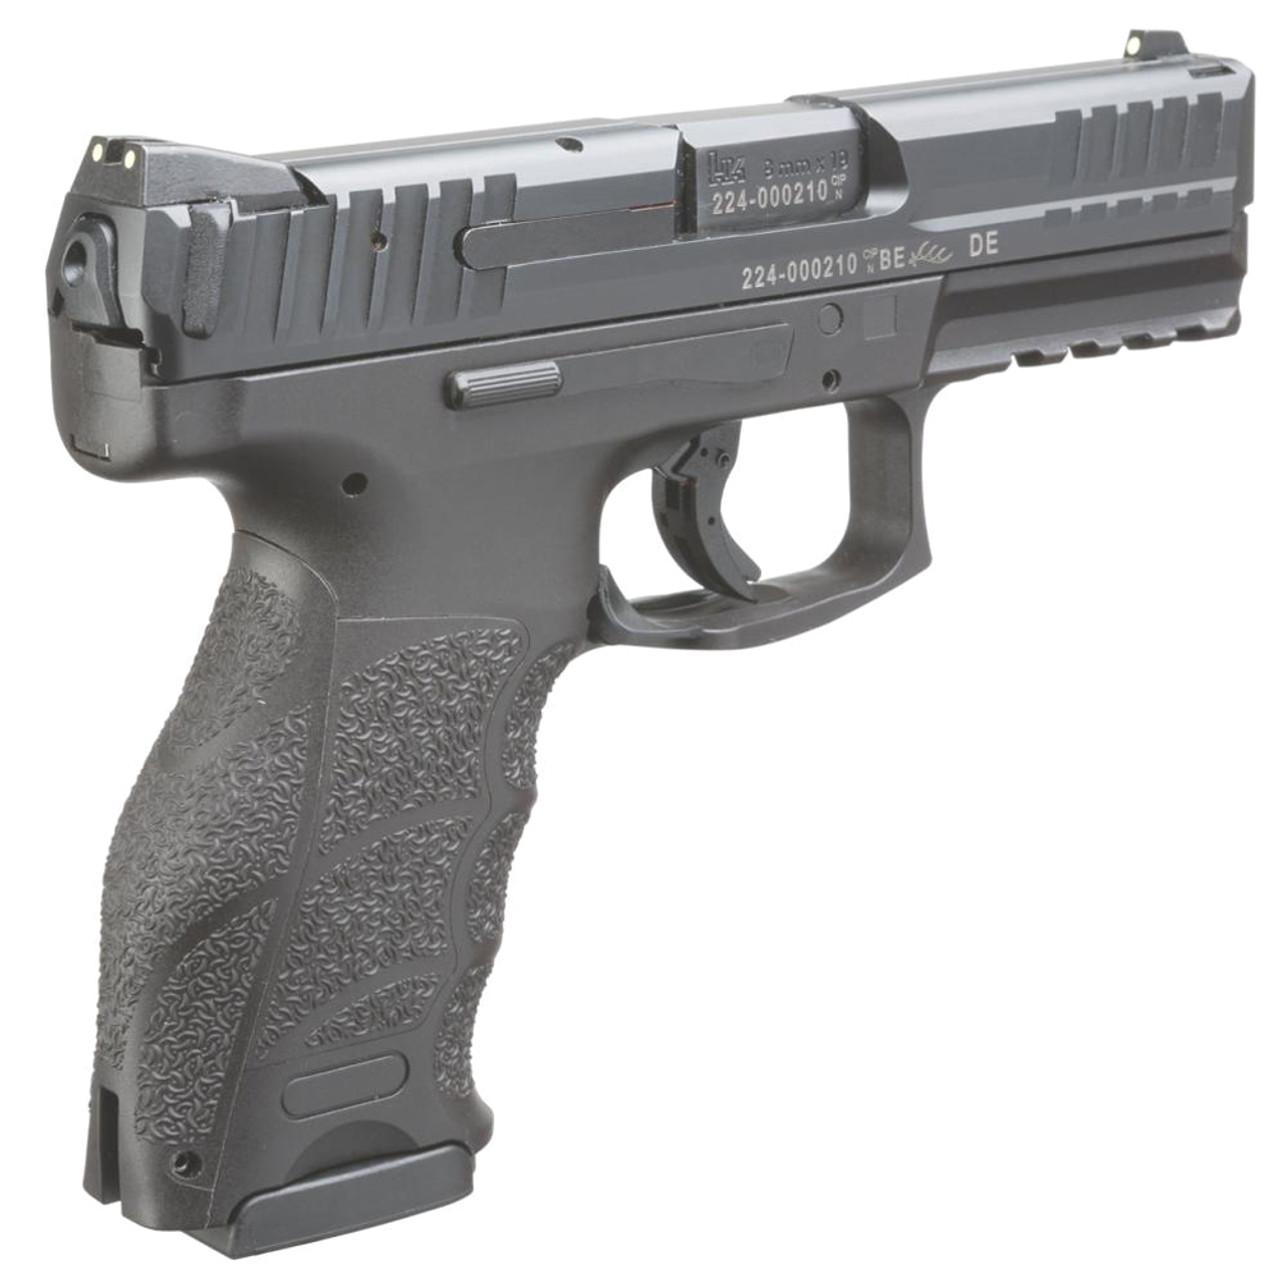 HK VP9 9mm 4 09in 15rd Semi-Automatic Pistol (700009-LE-A5)